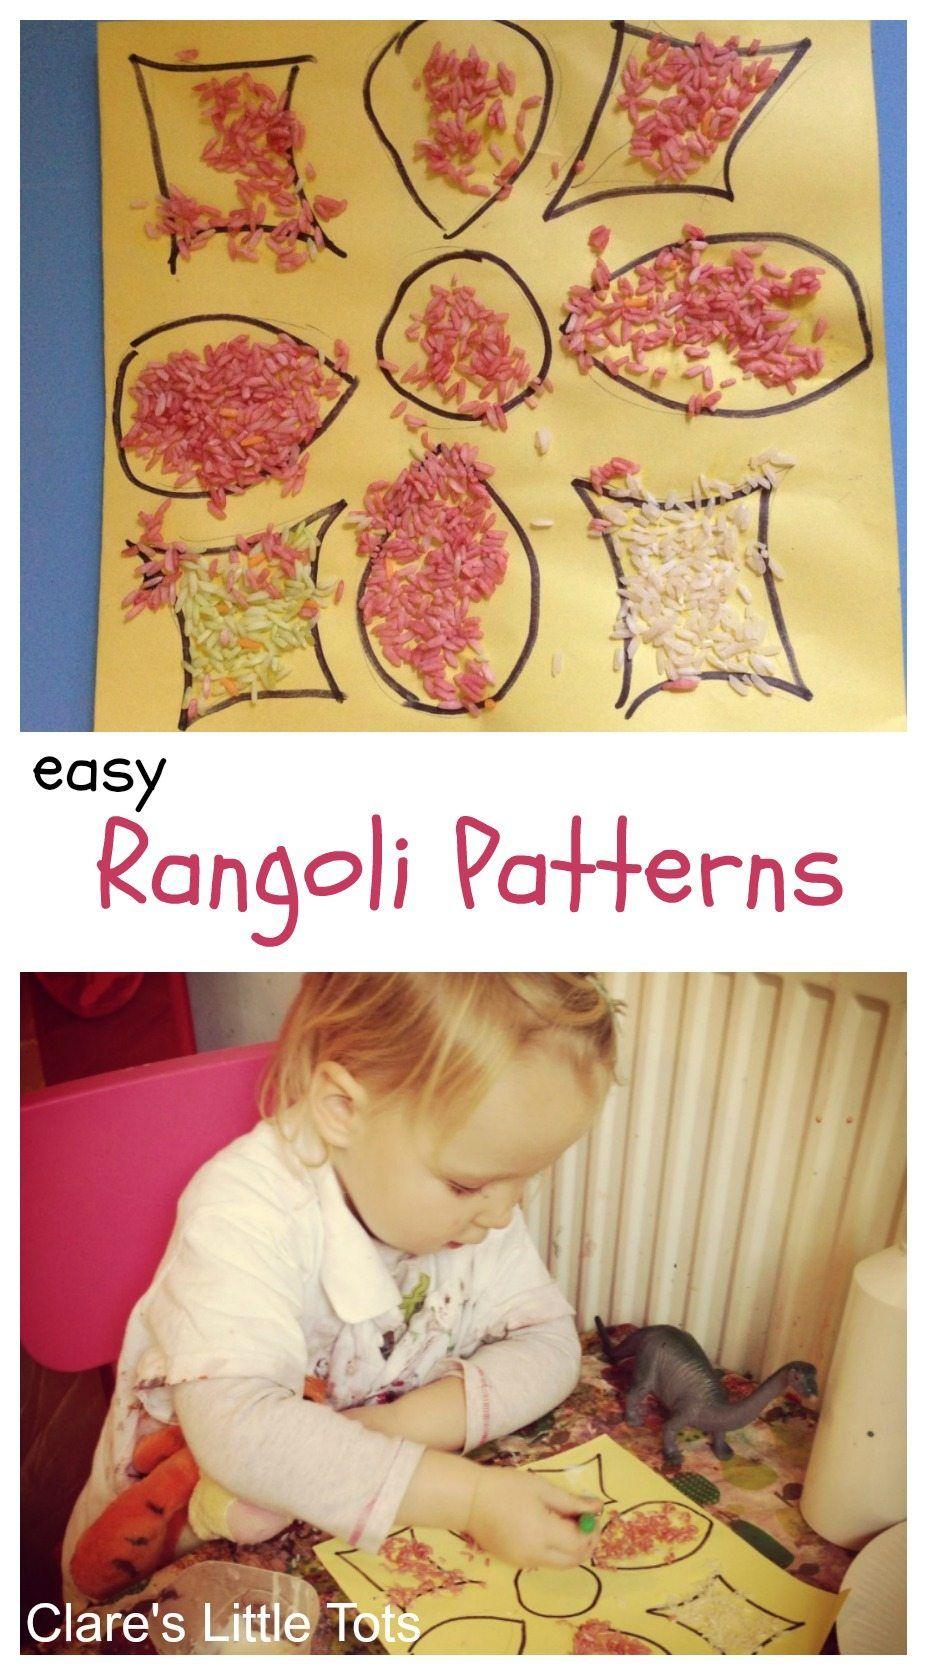 Easy Rangoli Patterns Diwali Activities Rangoli Patterns